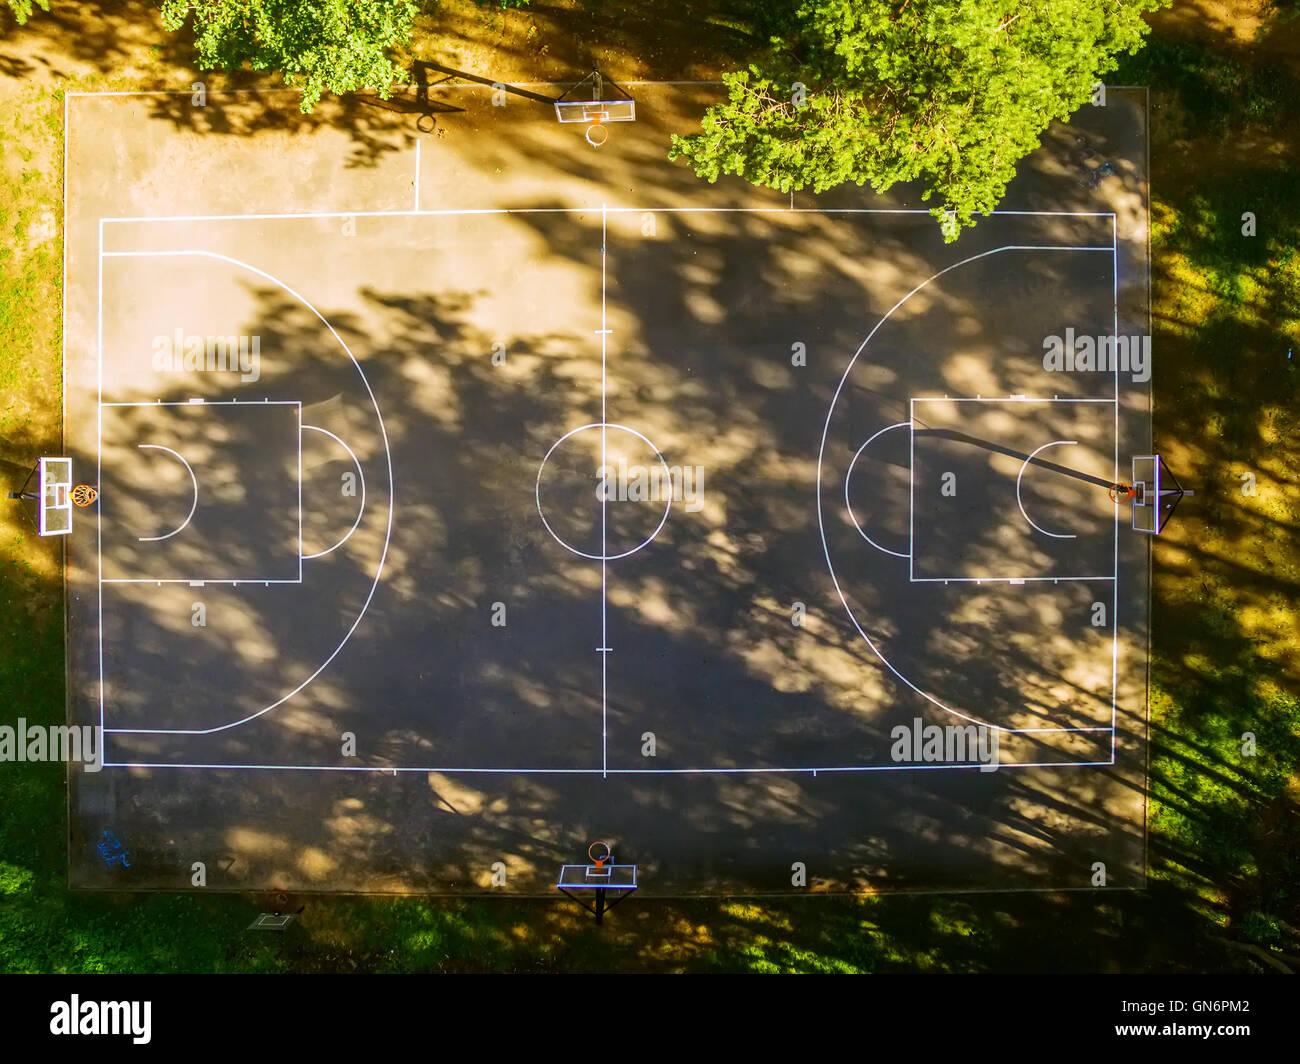 Basketball Court Aerial Stock Photos & Basketball Court ...